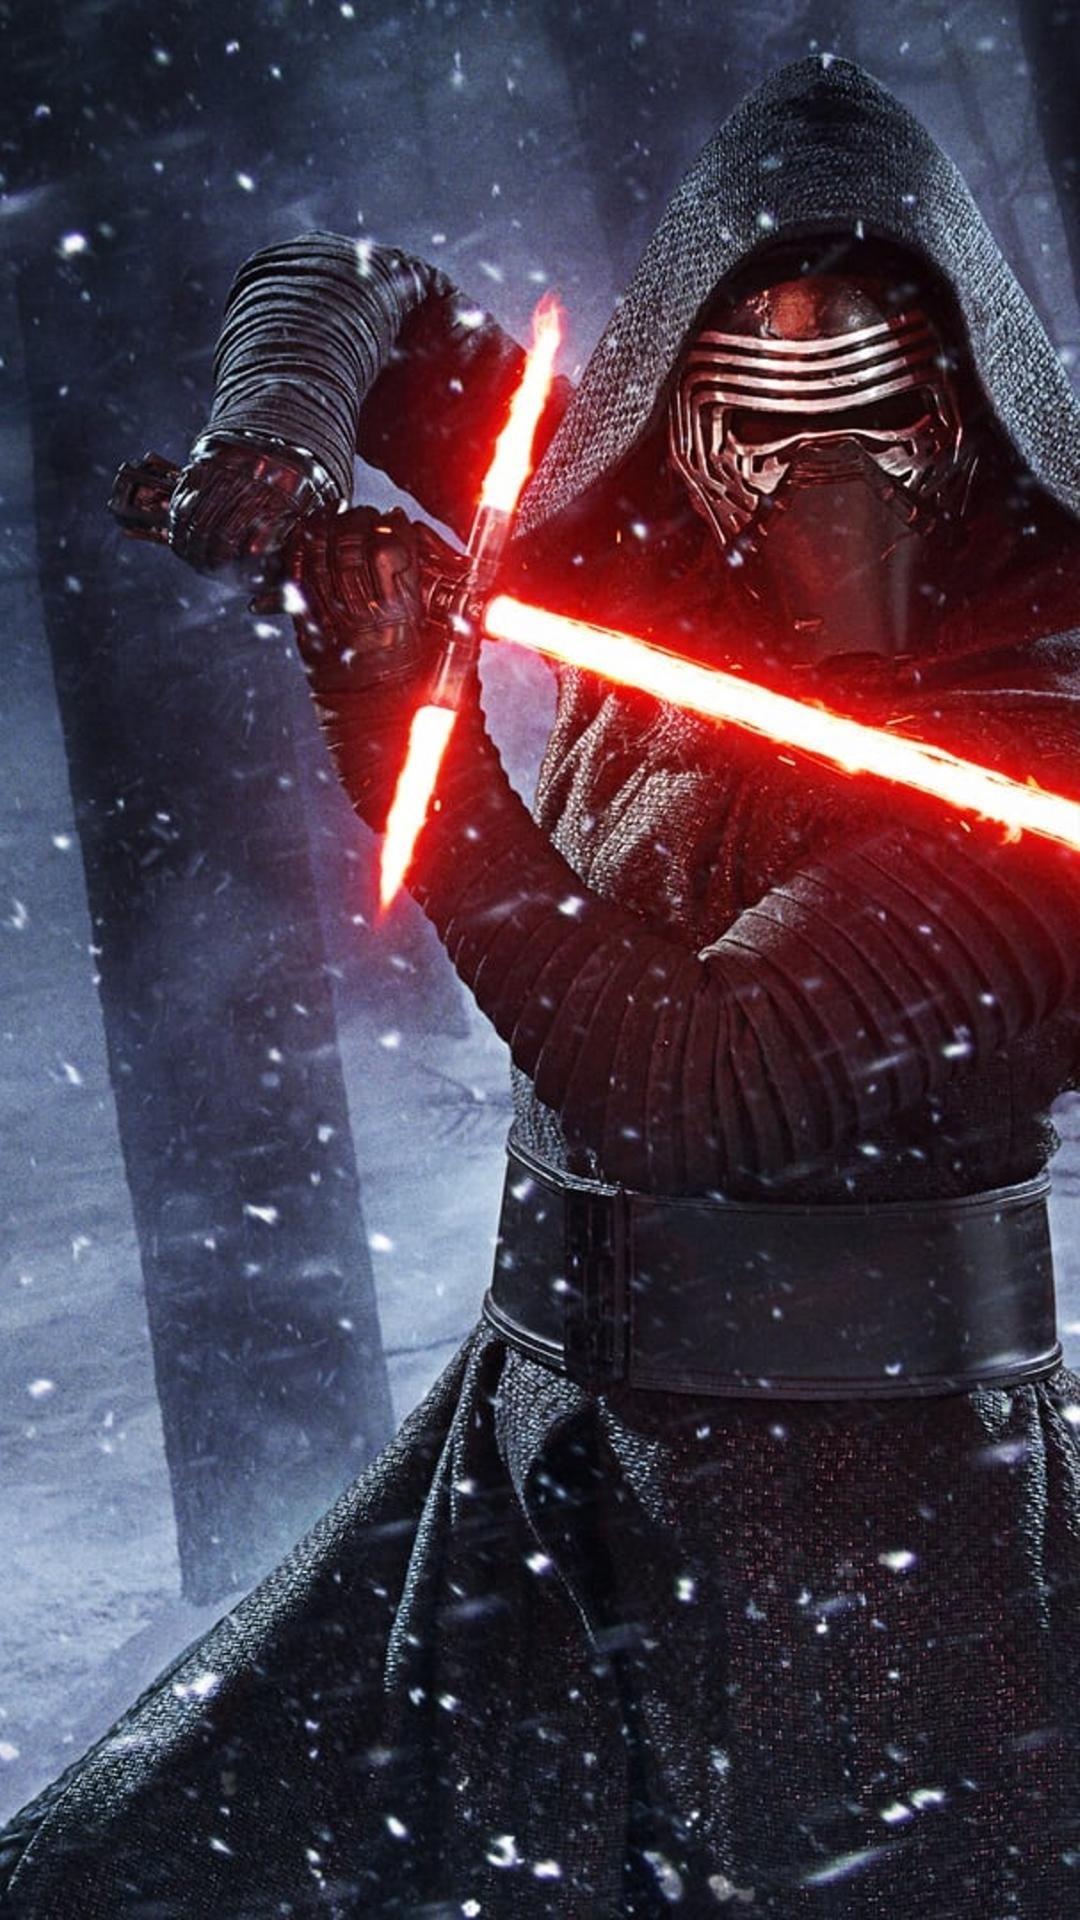 Epic Star Wars Battlefront Wallpaper Ios In 2020 Ren Star Wars Star Wars Wallpaper Star Wars Kylo Ren